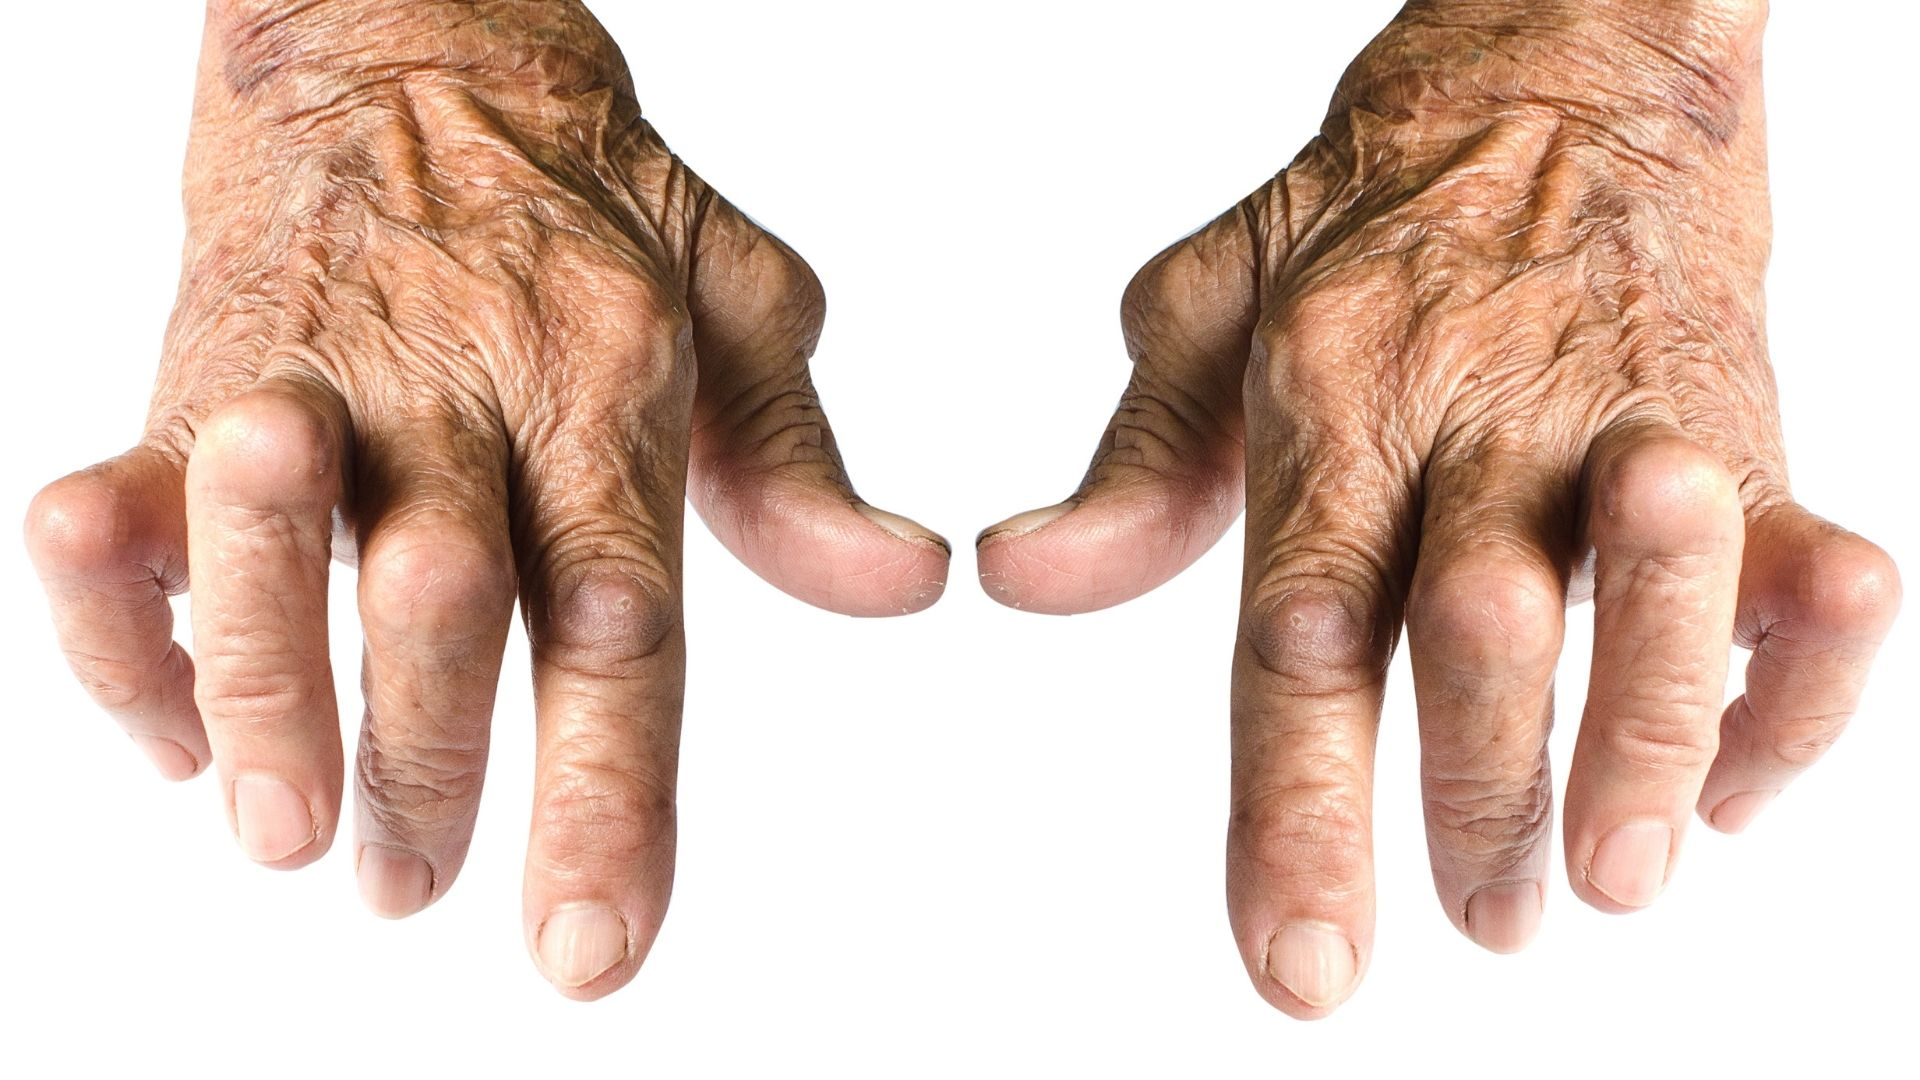 Osteoarthritis: the most common form of arthritis